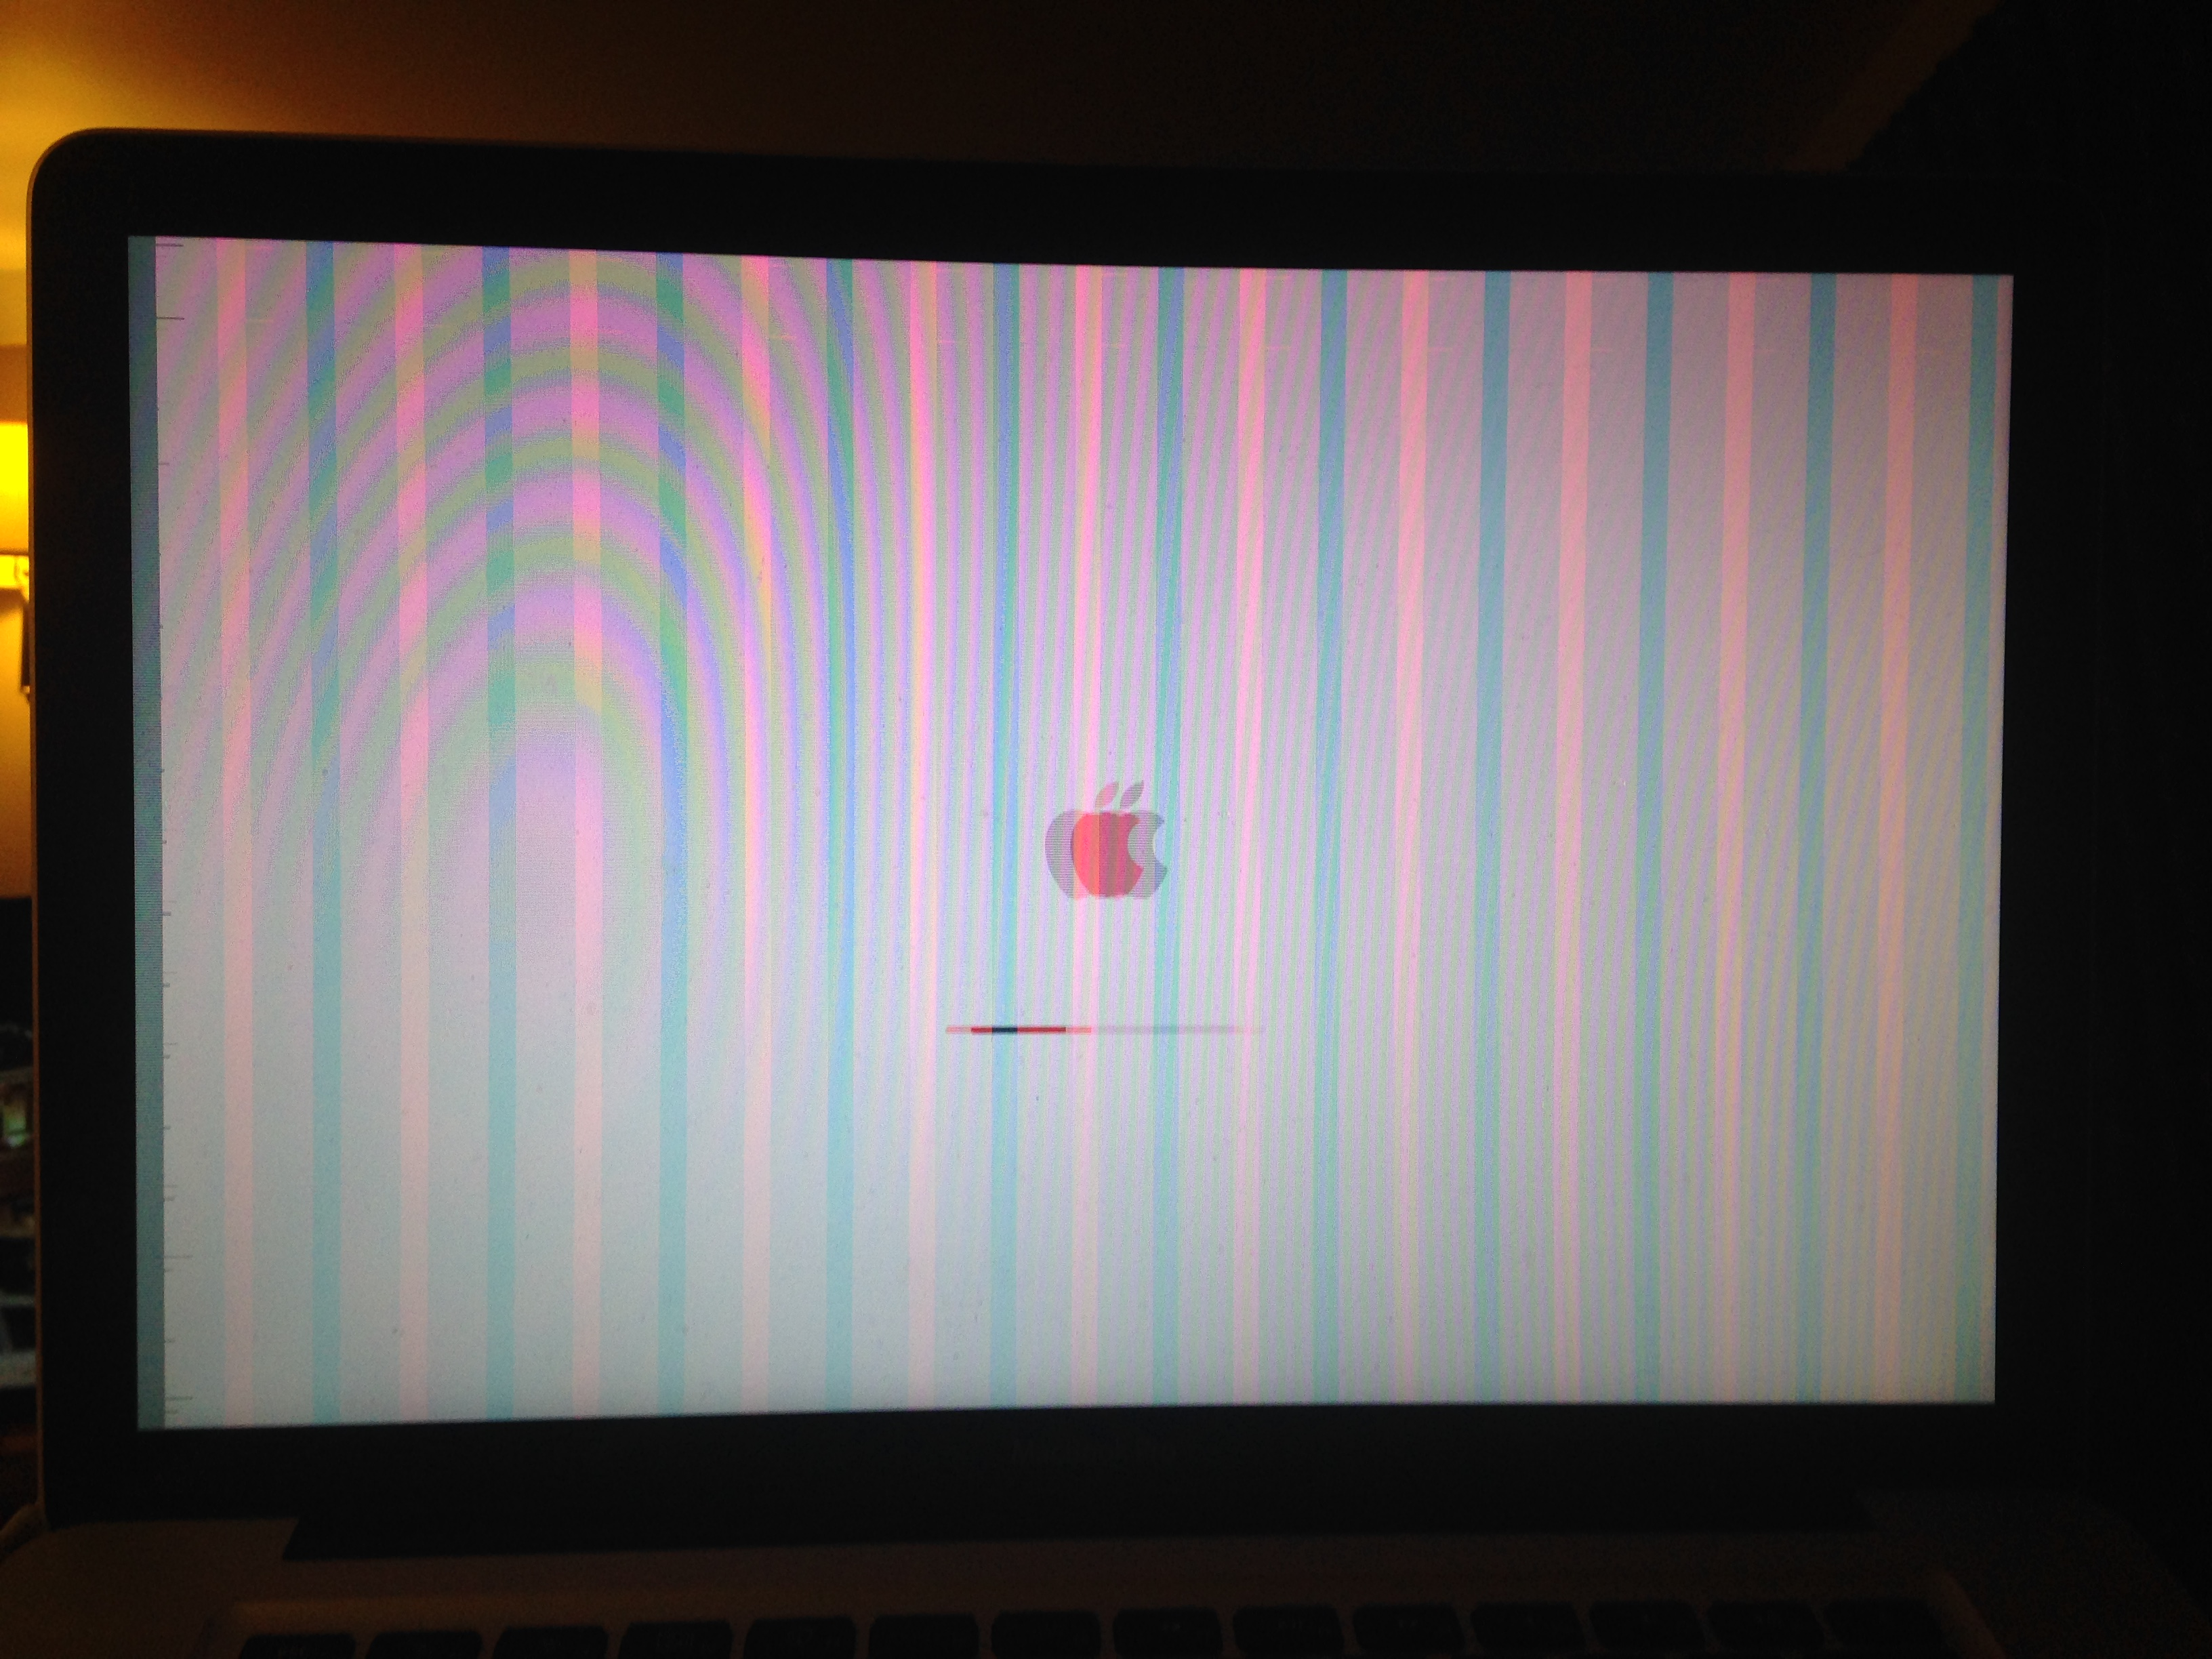 Macbook restarts repeatedly